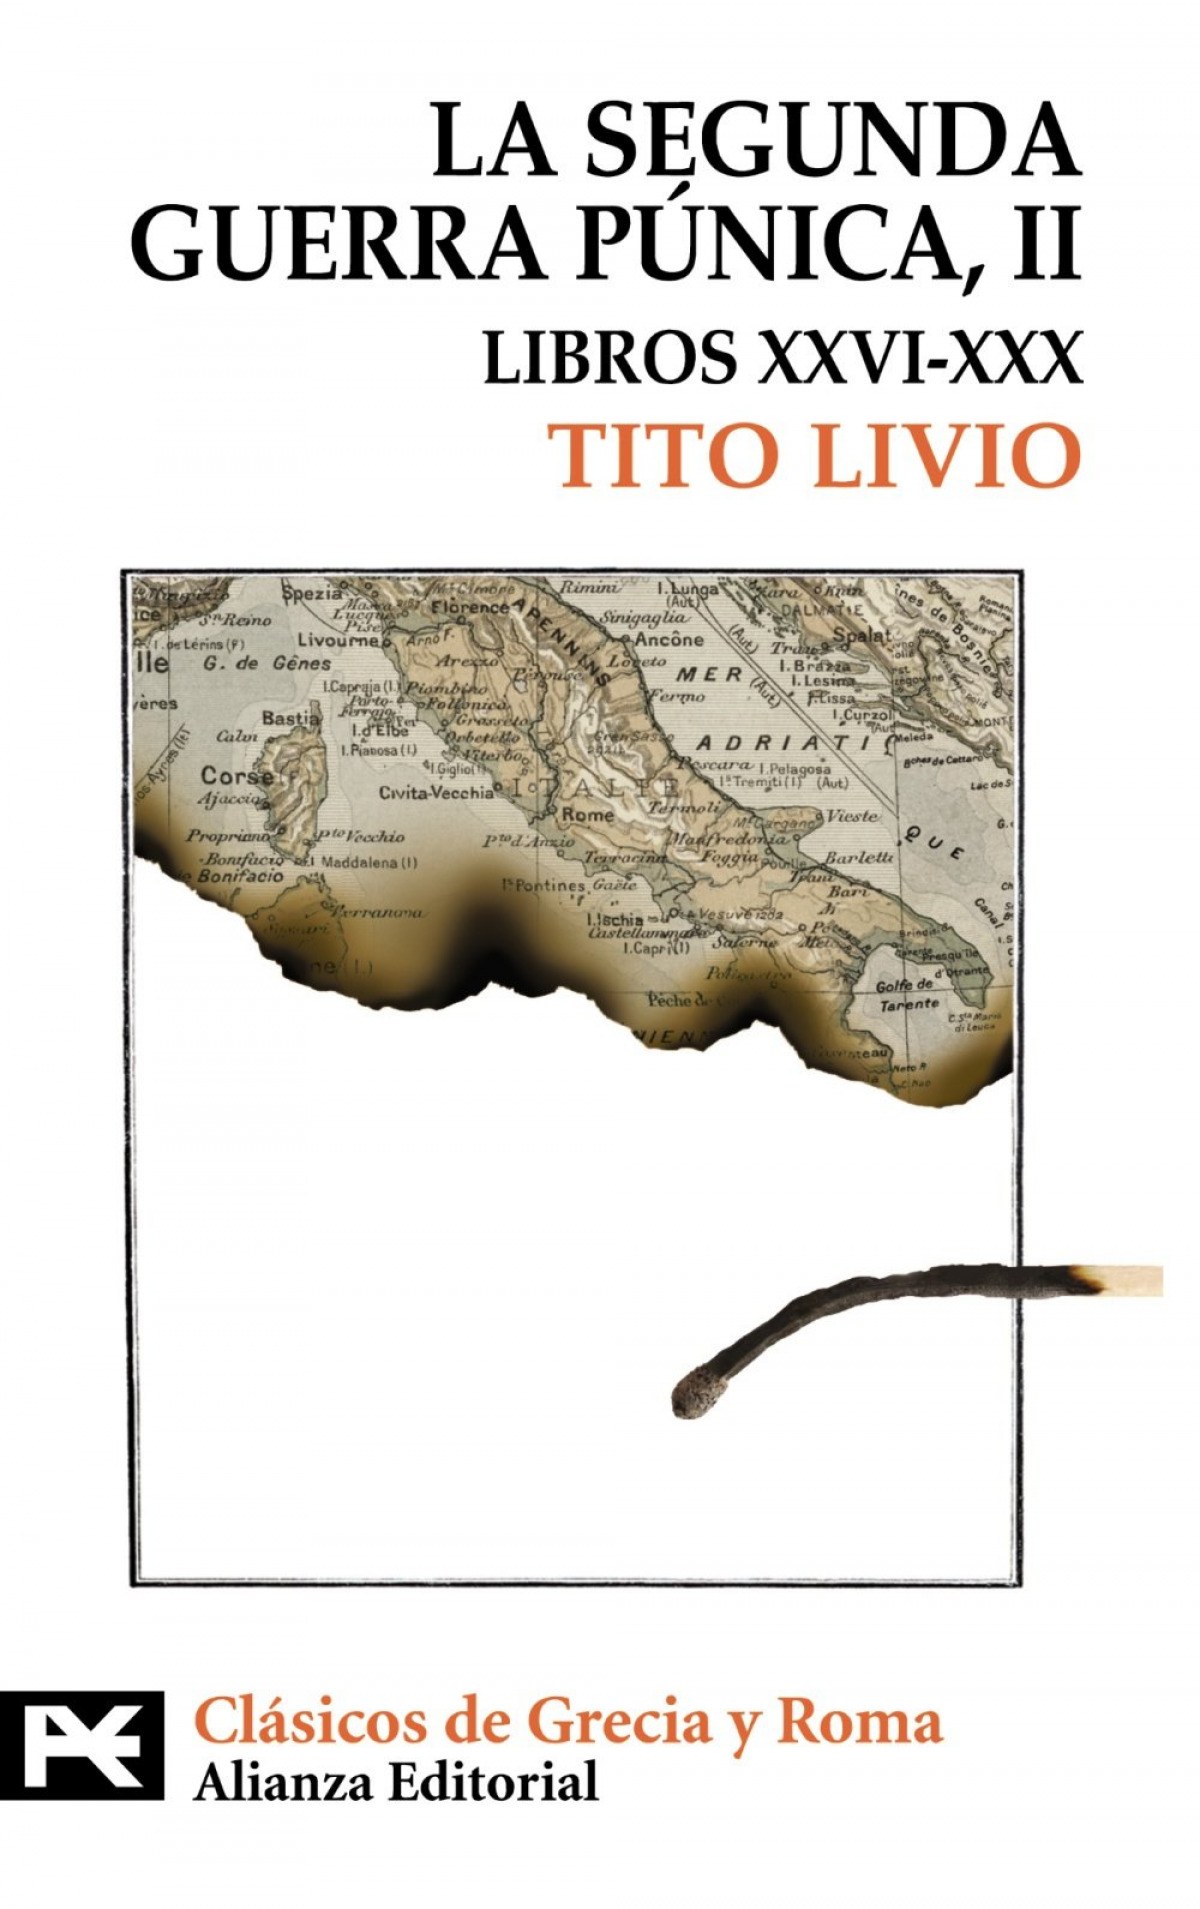 La segunda guerra púnica - Livio, Tito